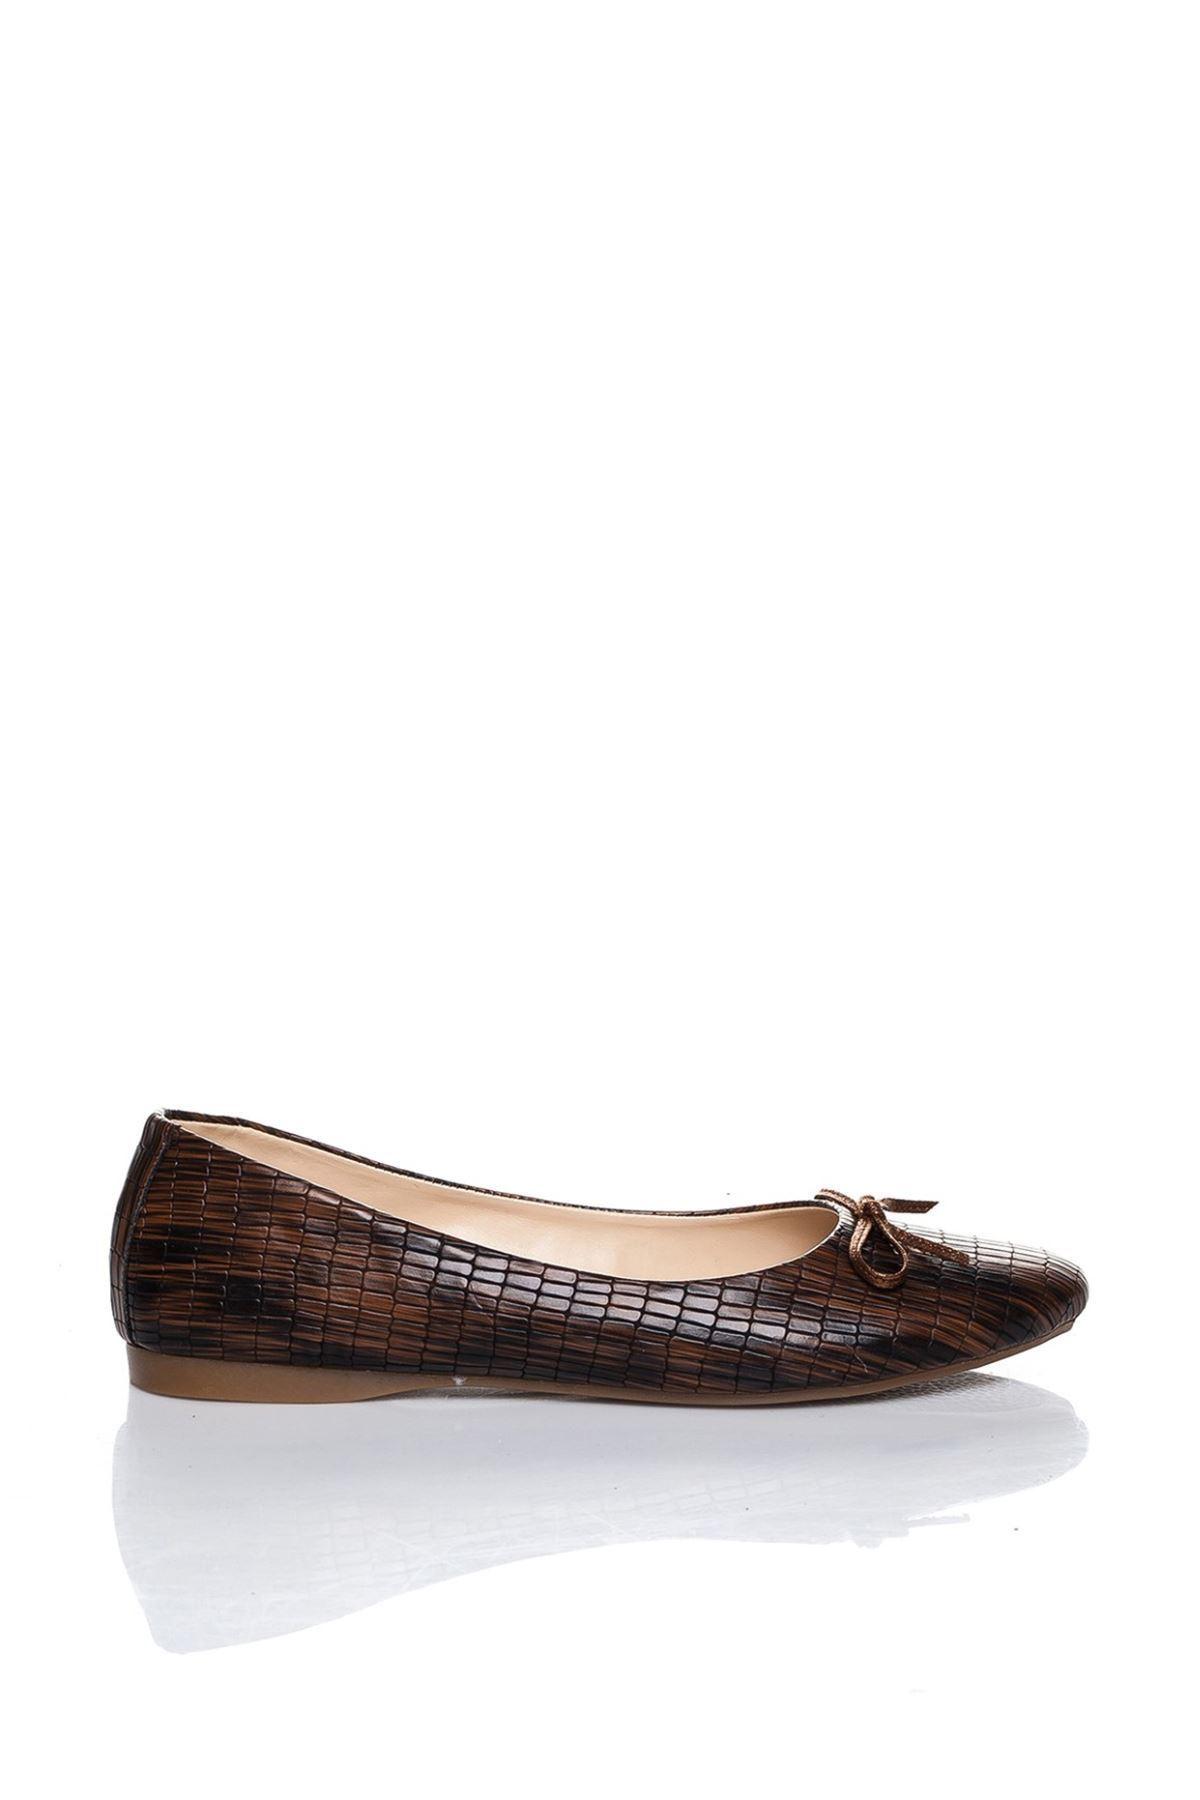 Lela Kahverengi Cilt Babet Ayakkabı